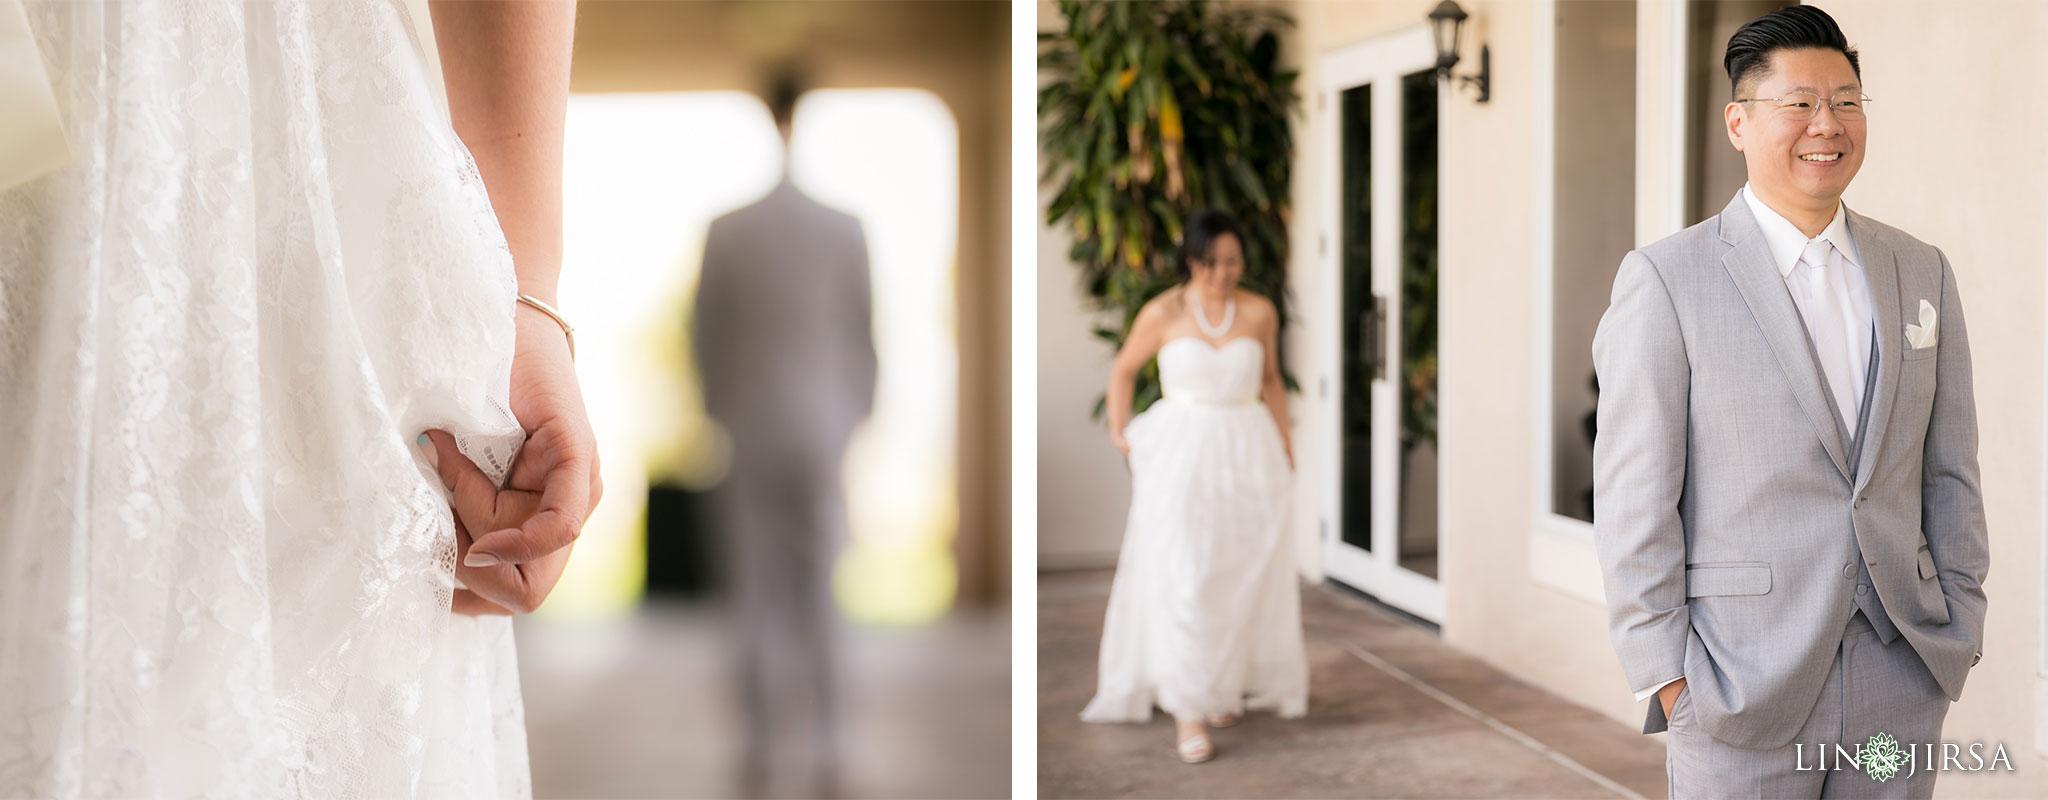 07 westridge golf club la habra first look wedding photography